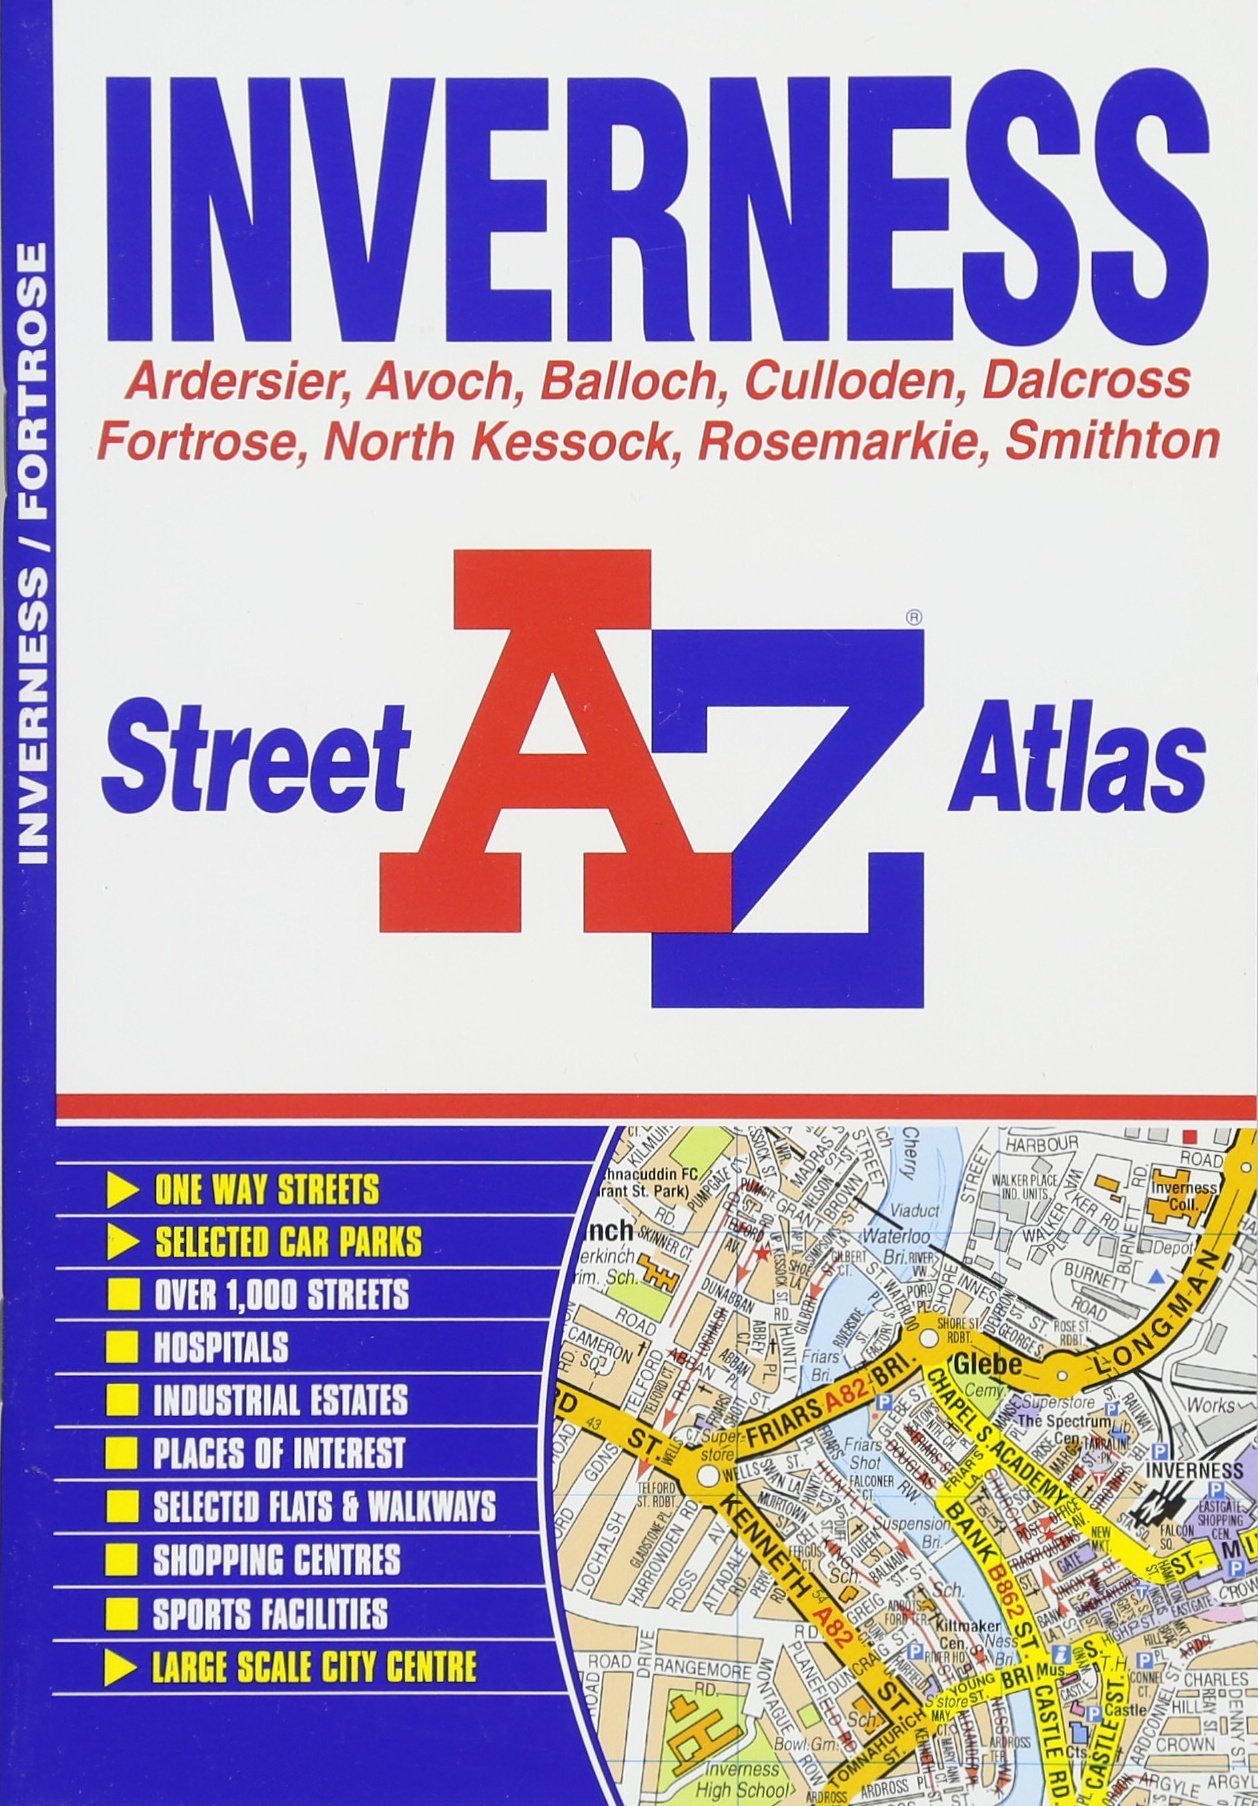 Inverness Street Atlas (A-Z Street Atlas)